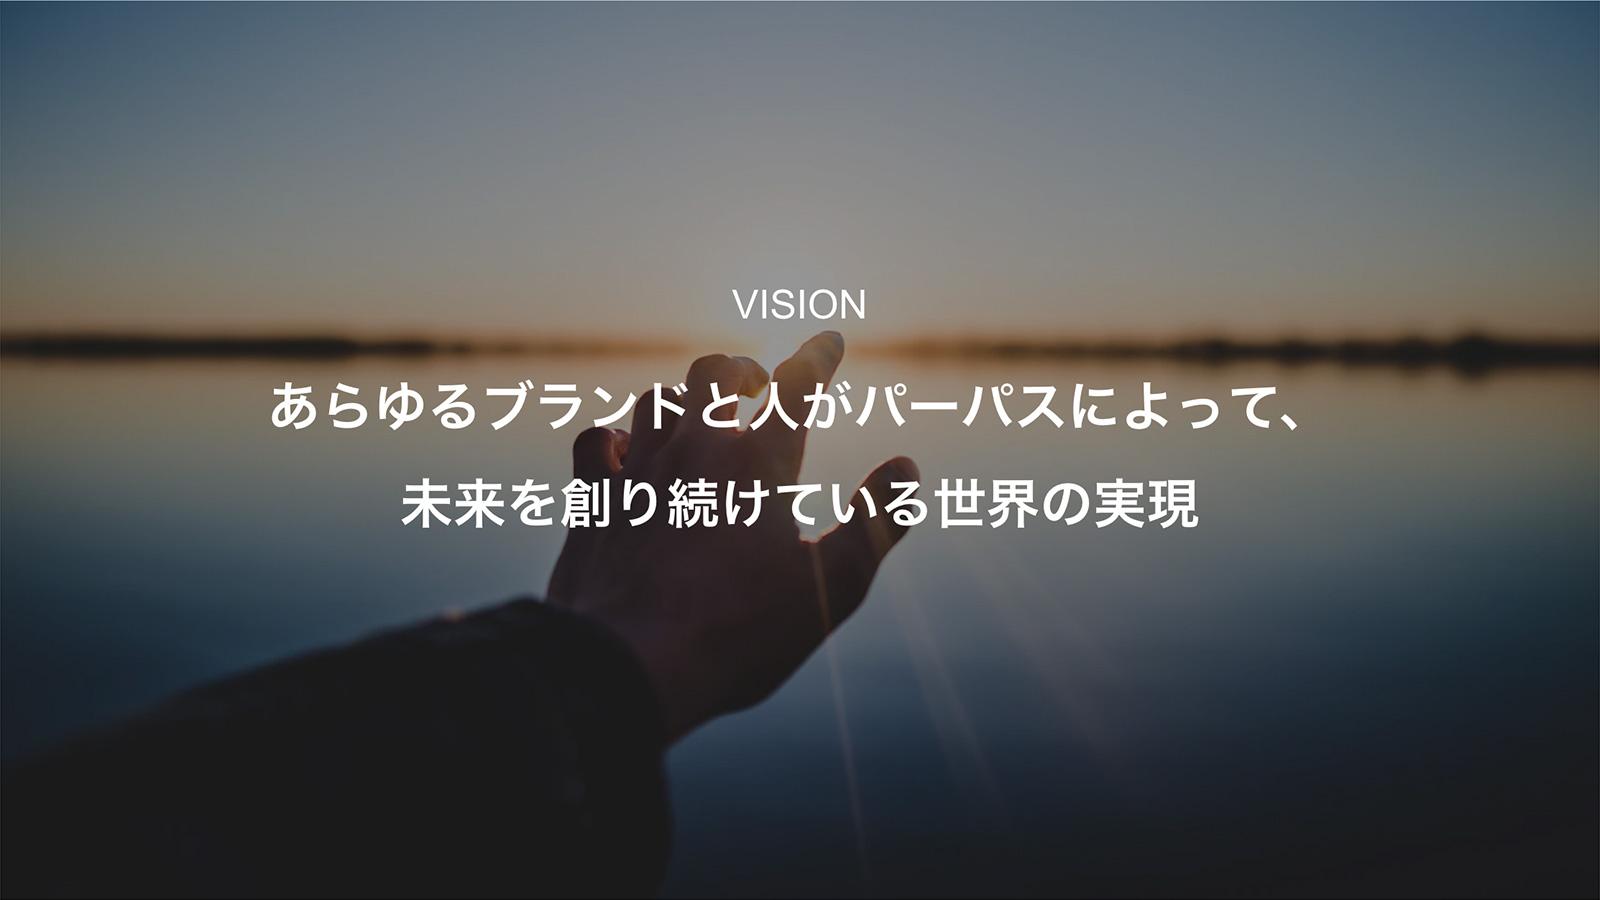 VISION あらゆるブランドと人がパーパスによって、未来の価値を創造し続けている世界の実現